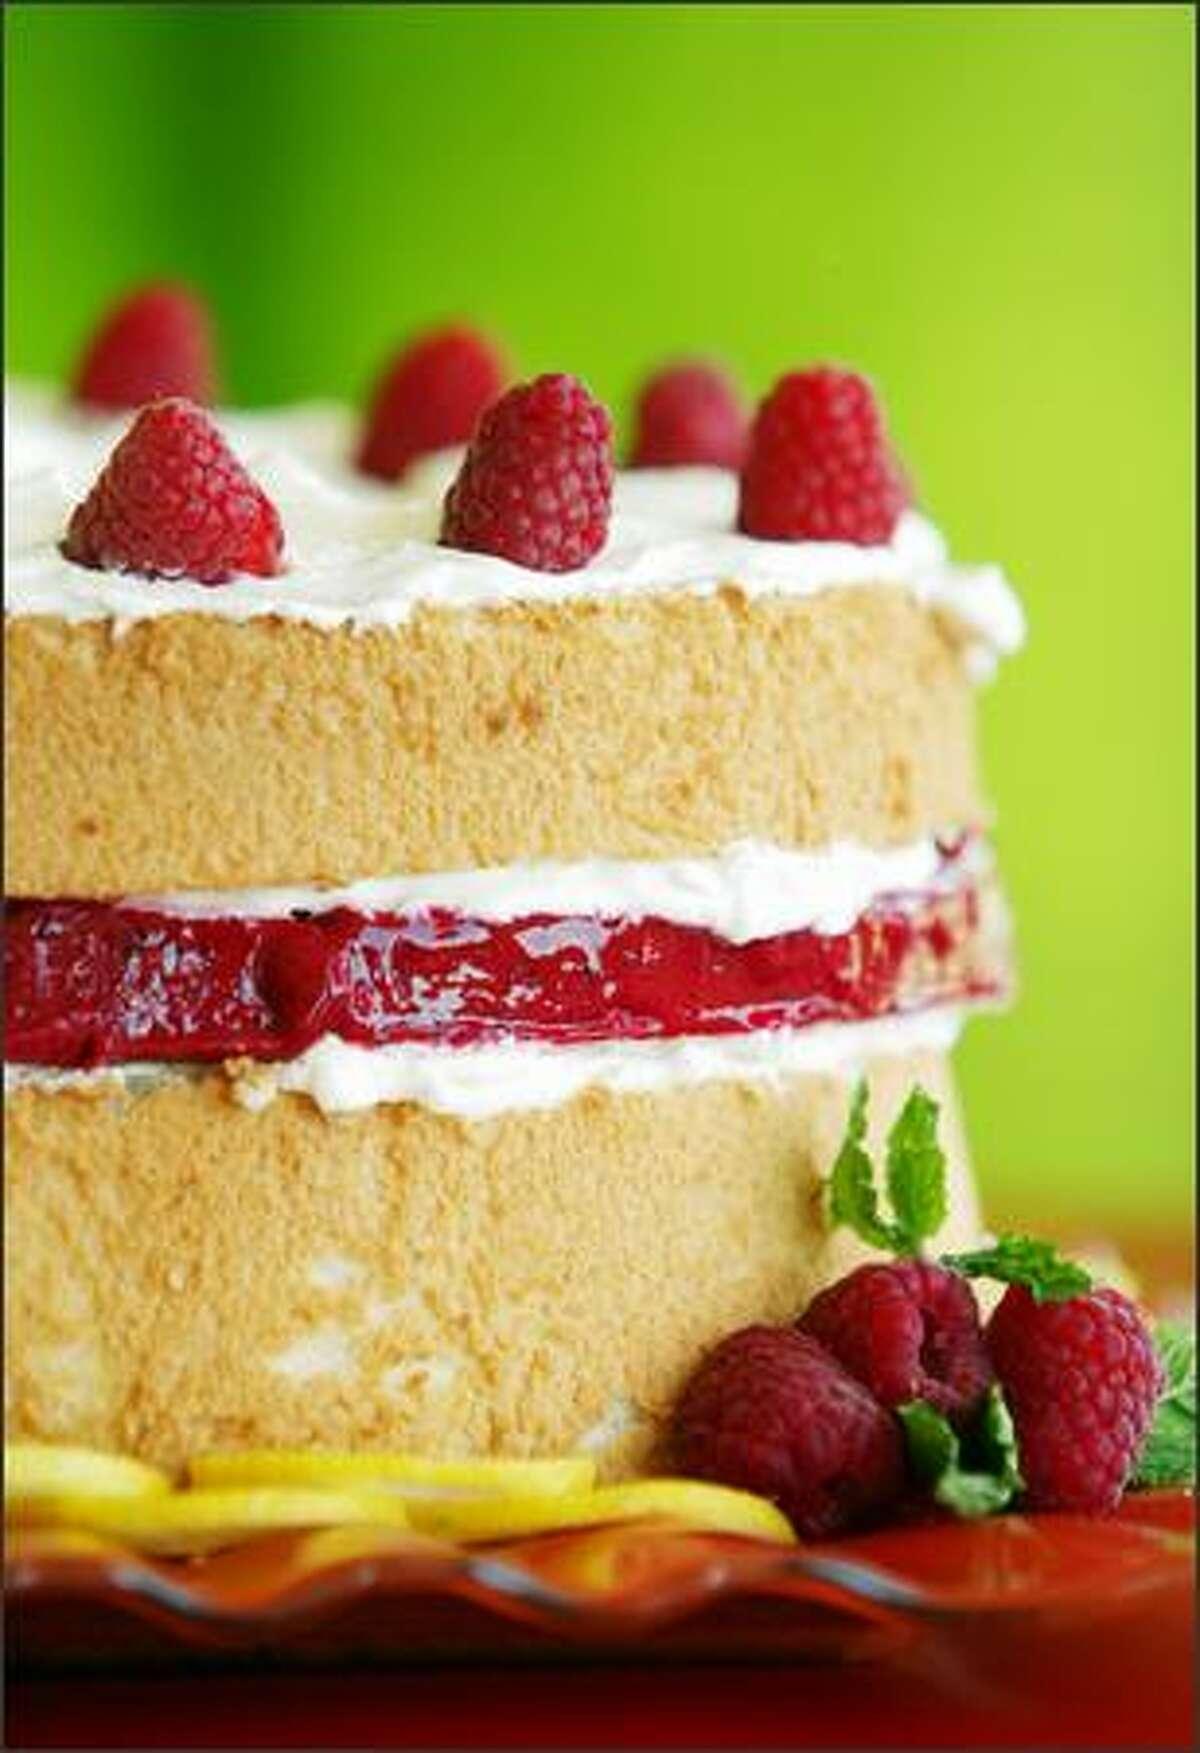 Raspberry sorbet layered in a lemon-ginger angel food cake.